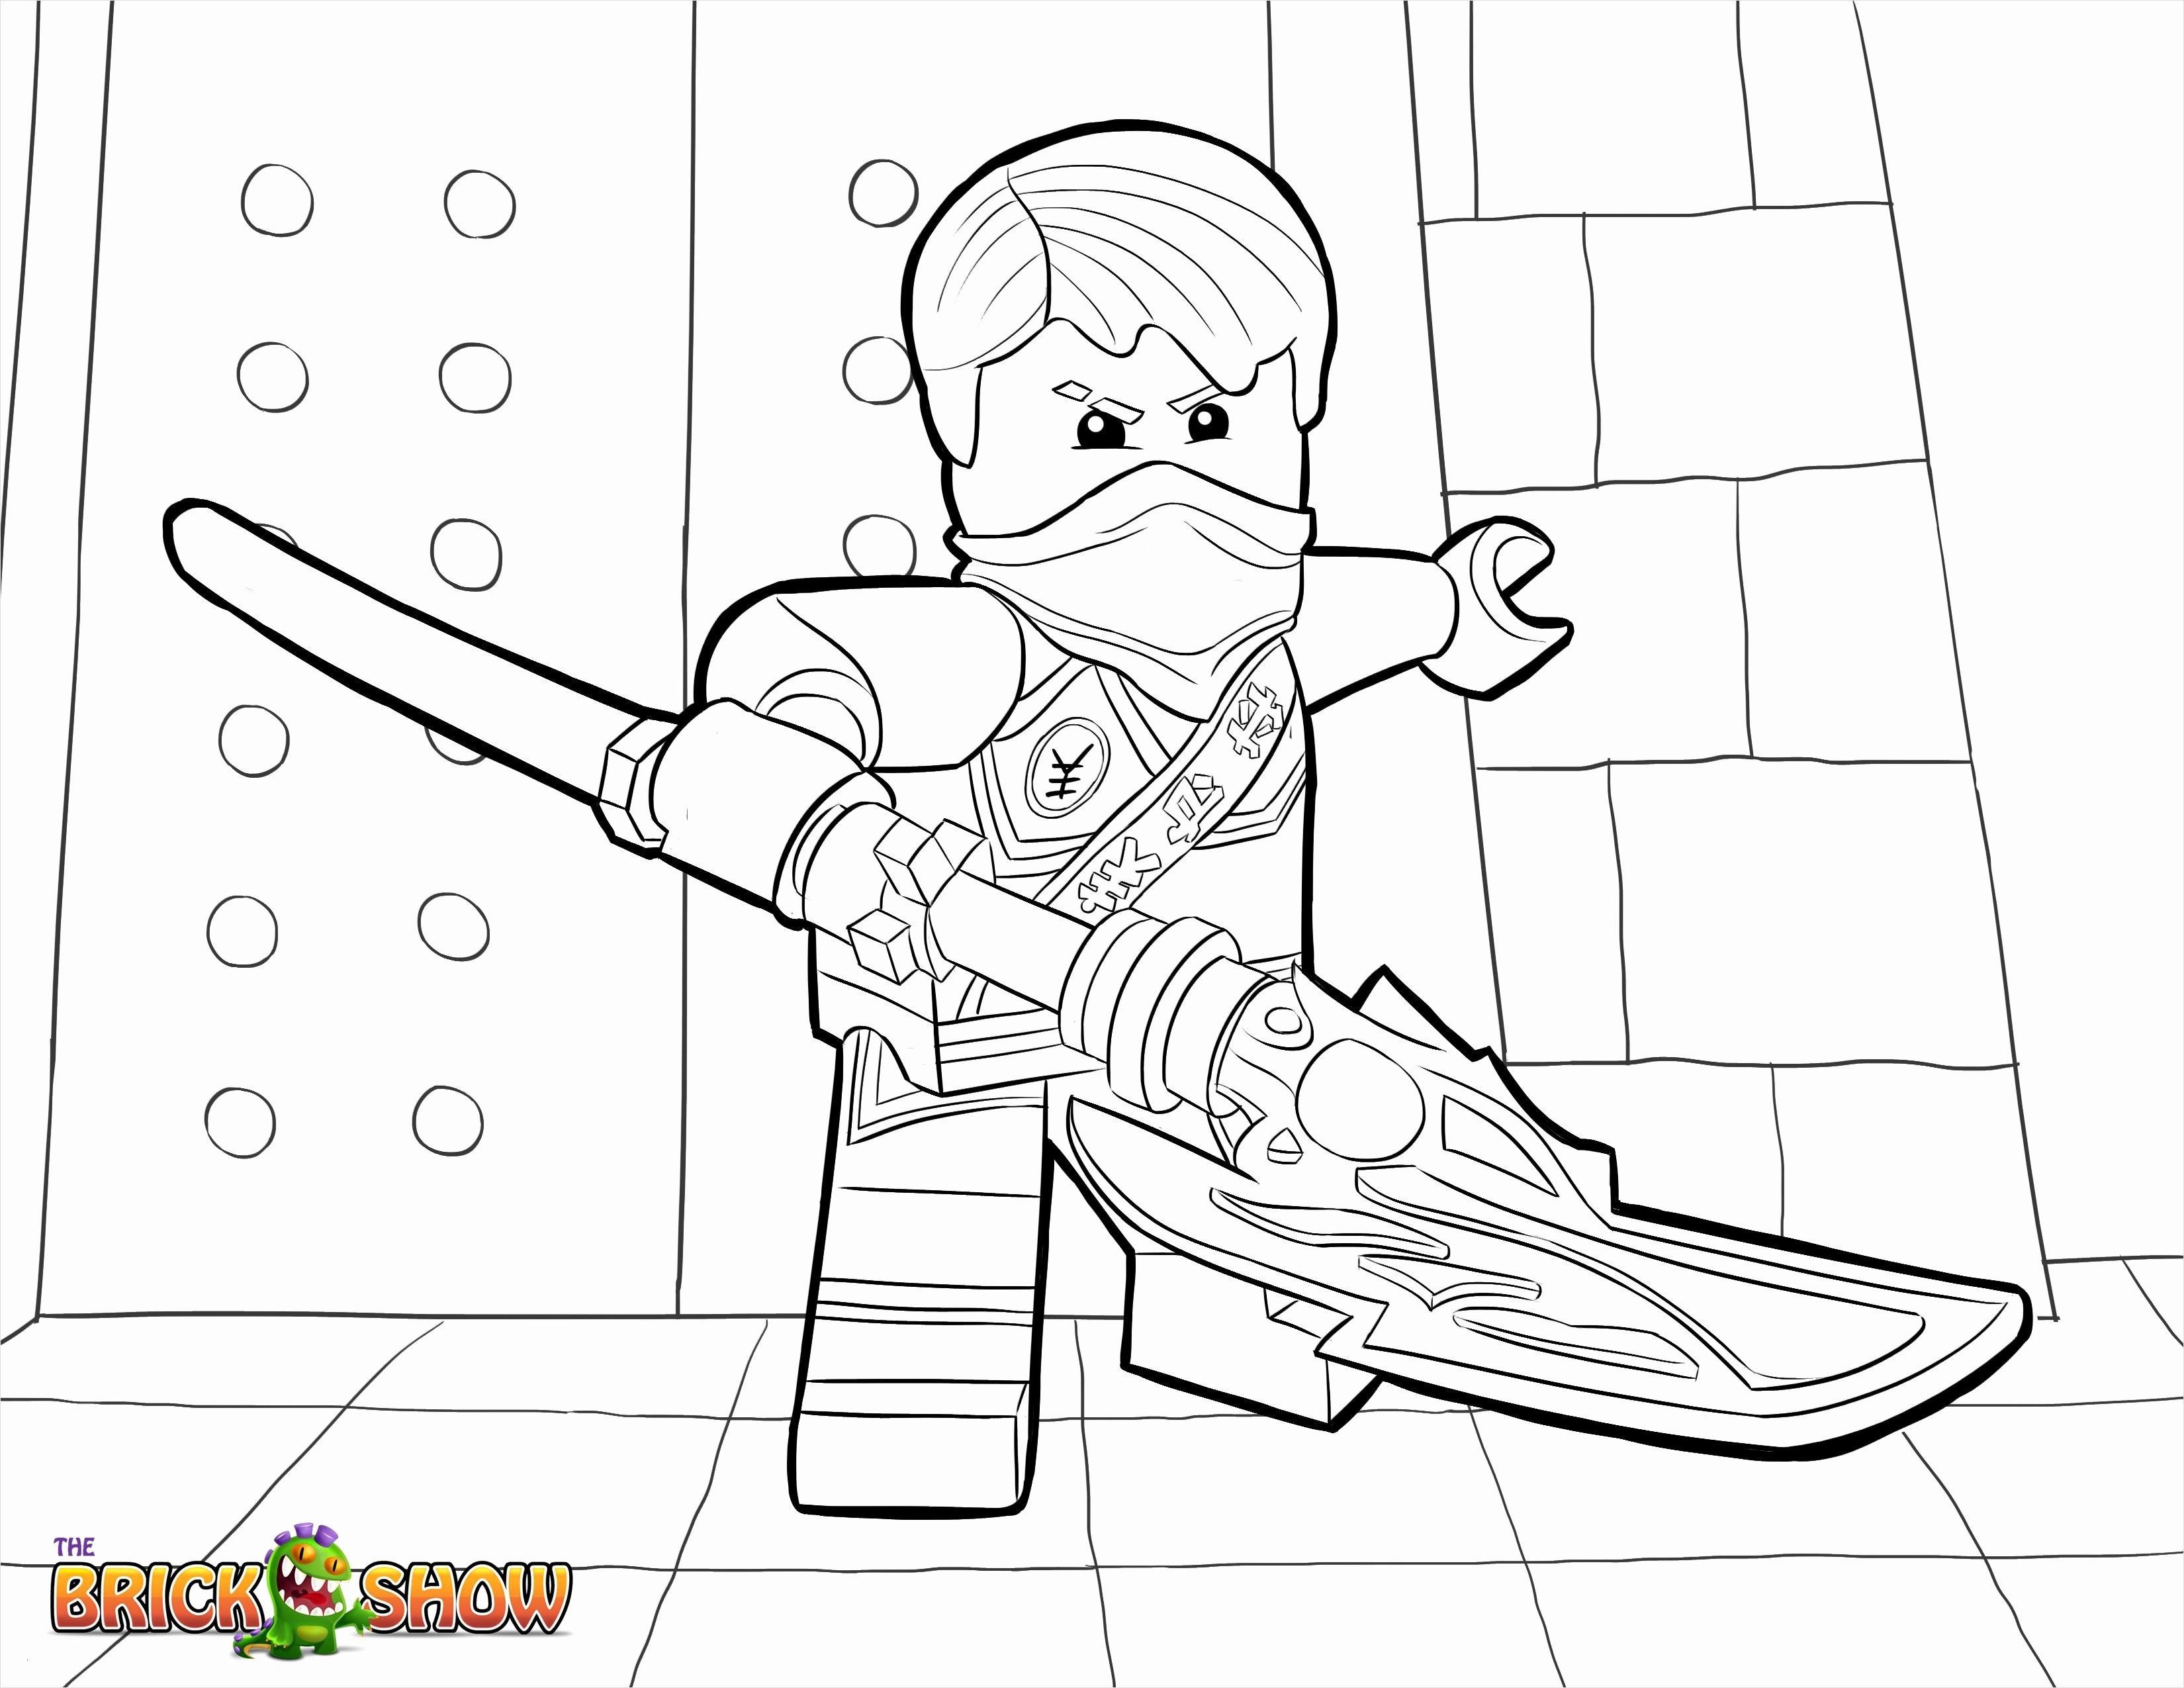 Ninjago Ausmalbilder Lord Garmadon Das Beste Von 37 Lego Ninjago Lloyd Ausmalbilder Scoredatscore Frisch Lego Ninjago Das Bild